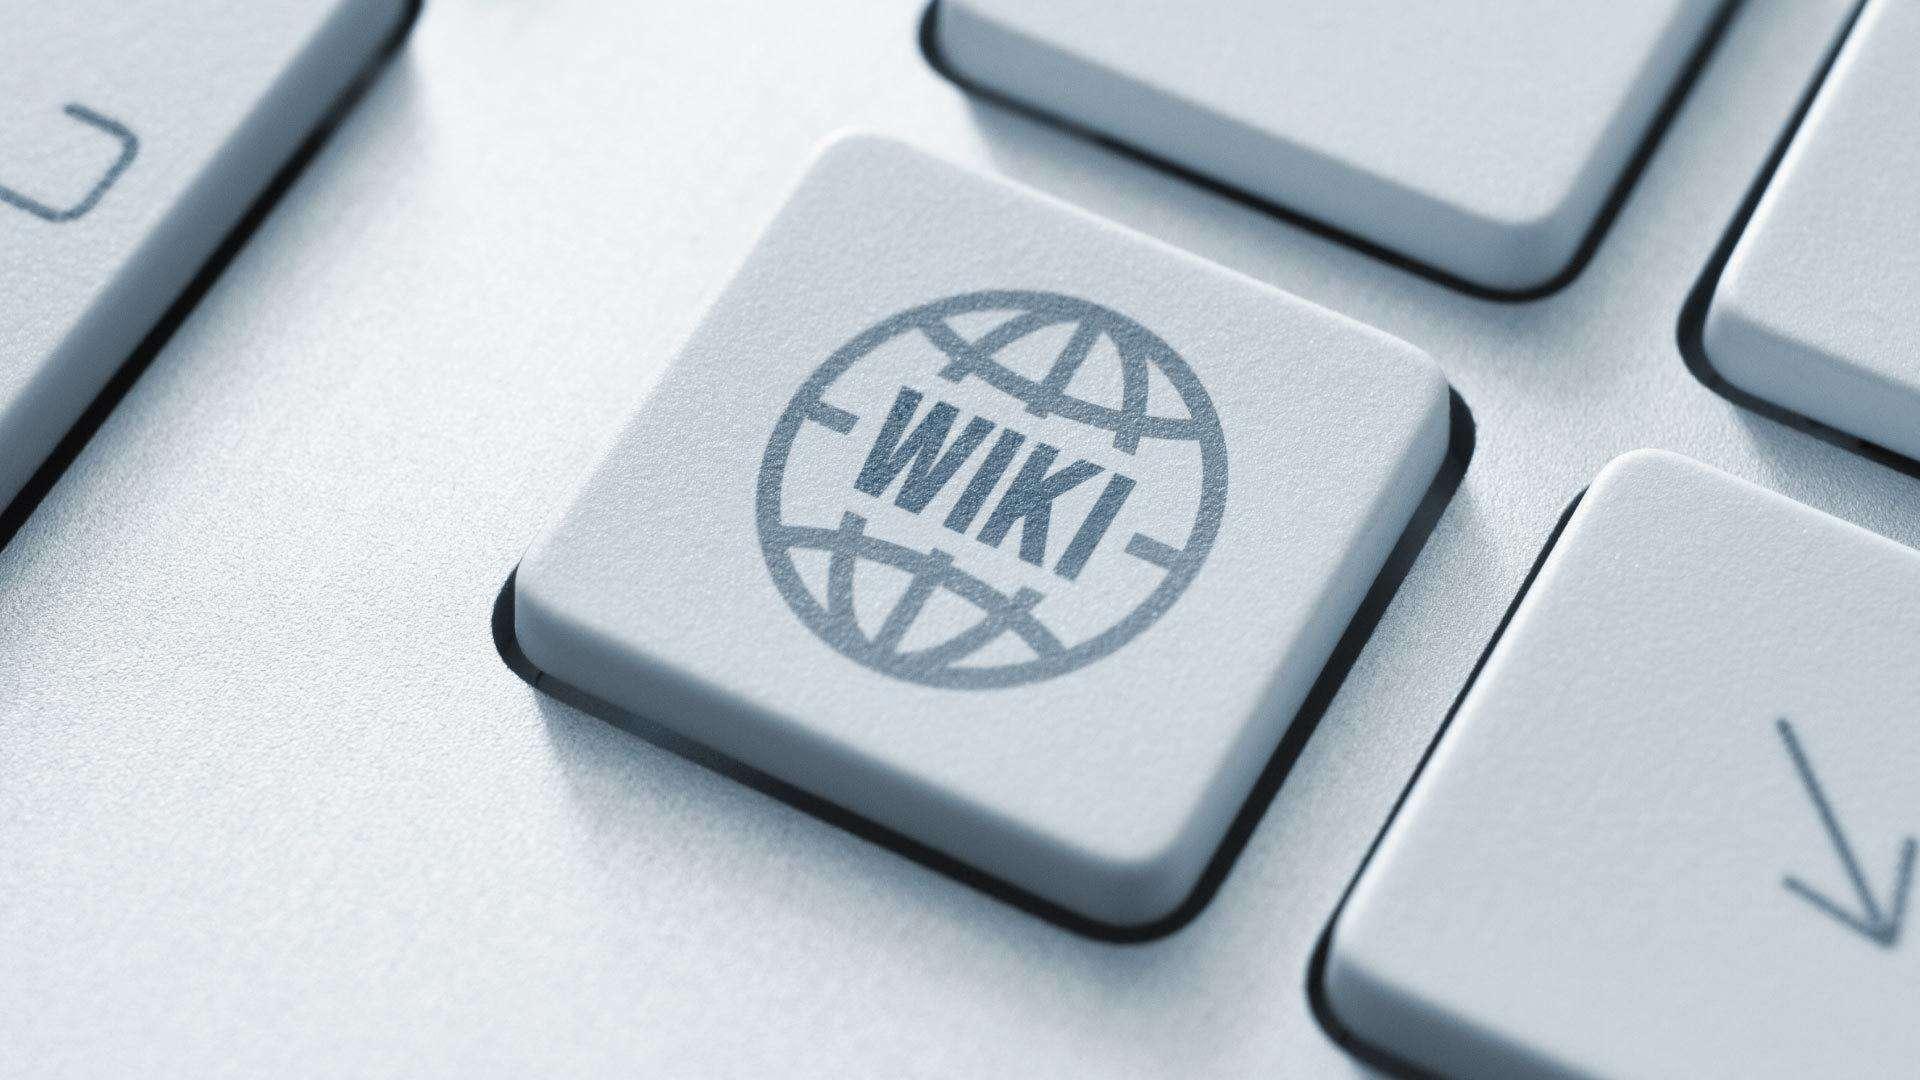 Most Popular Wiki Sites